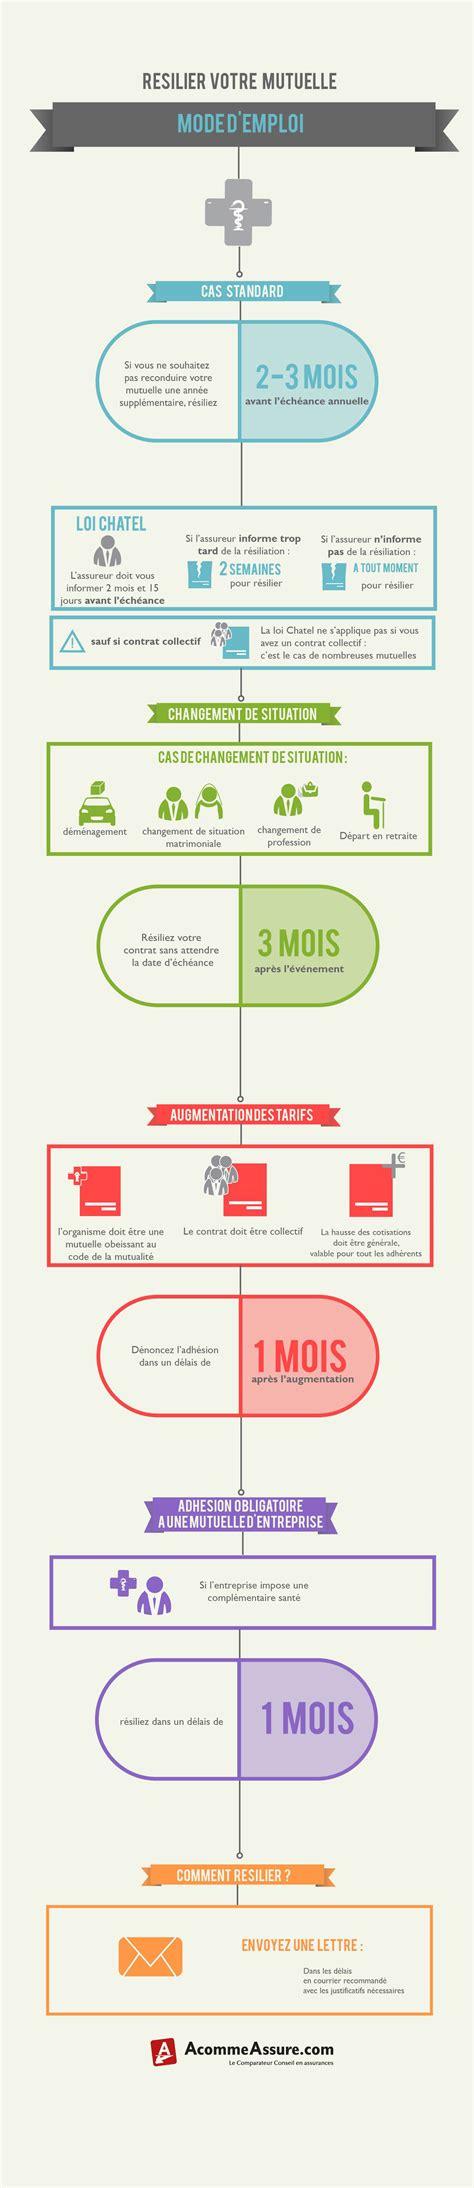 modele lettre resiliation assurance prevoyance loi chatel ebook lettre de resiliation mutuelle loi chatel pdf